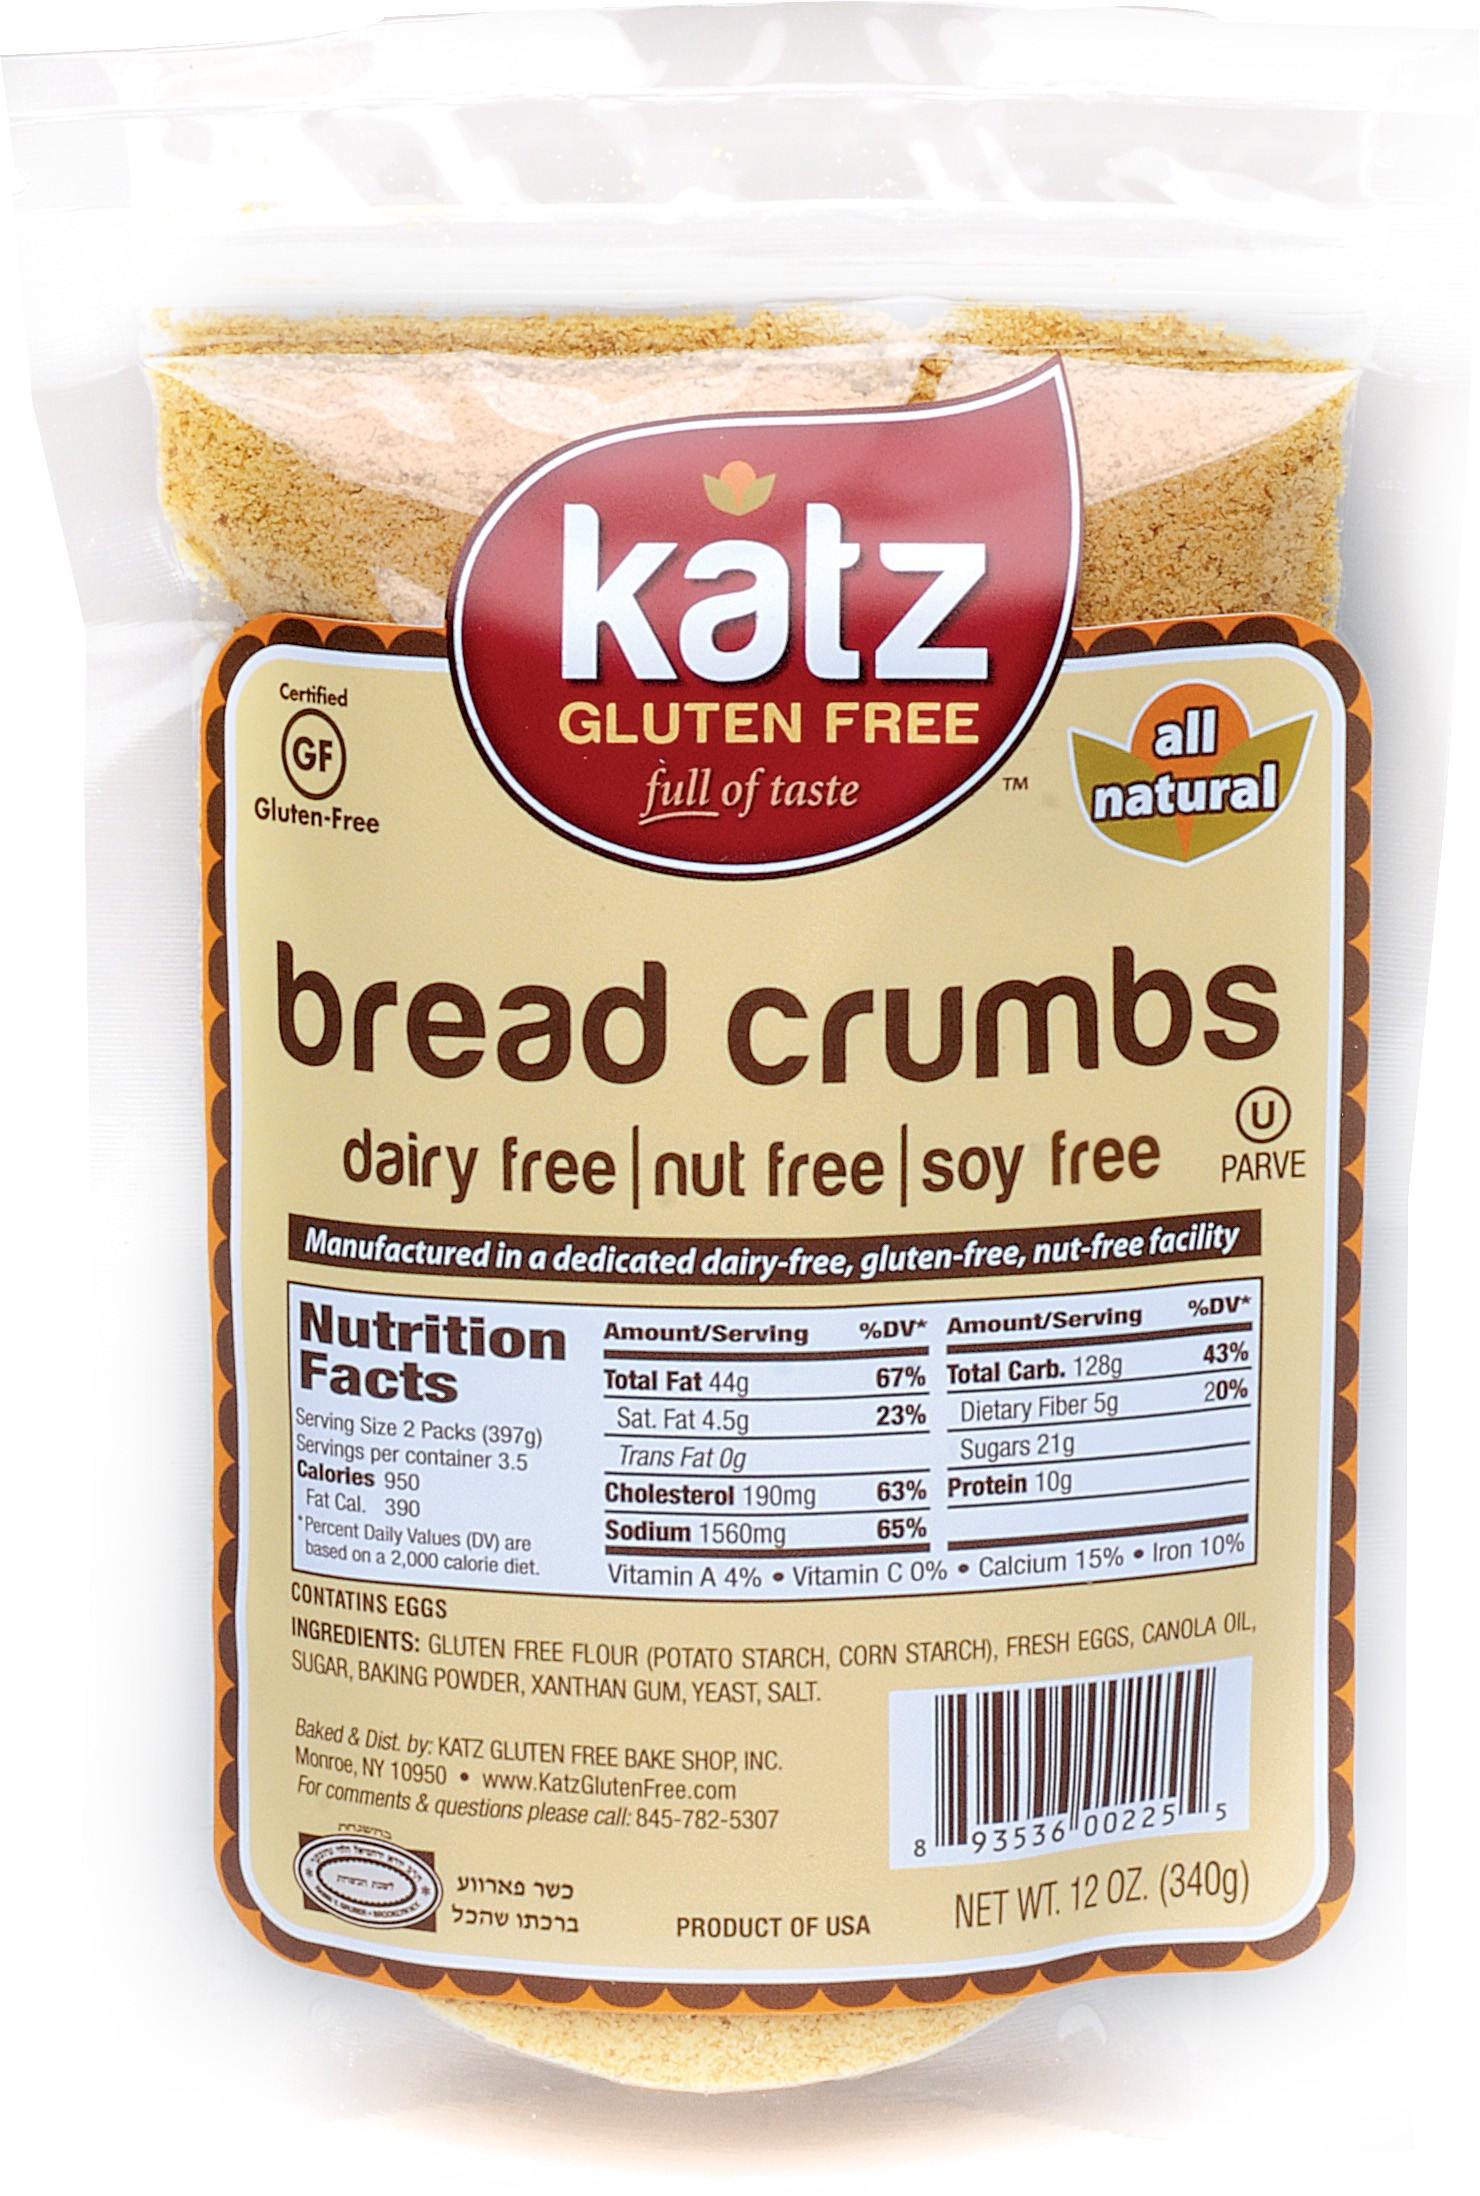 Are Bread Crumbs Gluten Free  Katz Gluten Free Bread Crumbs